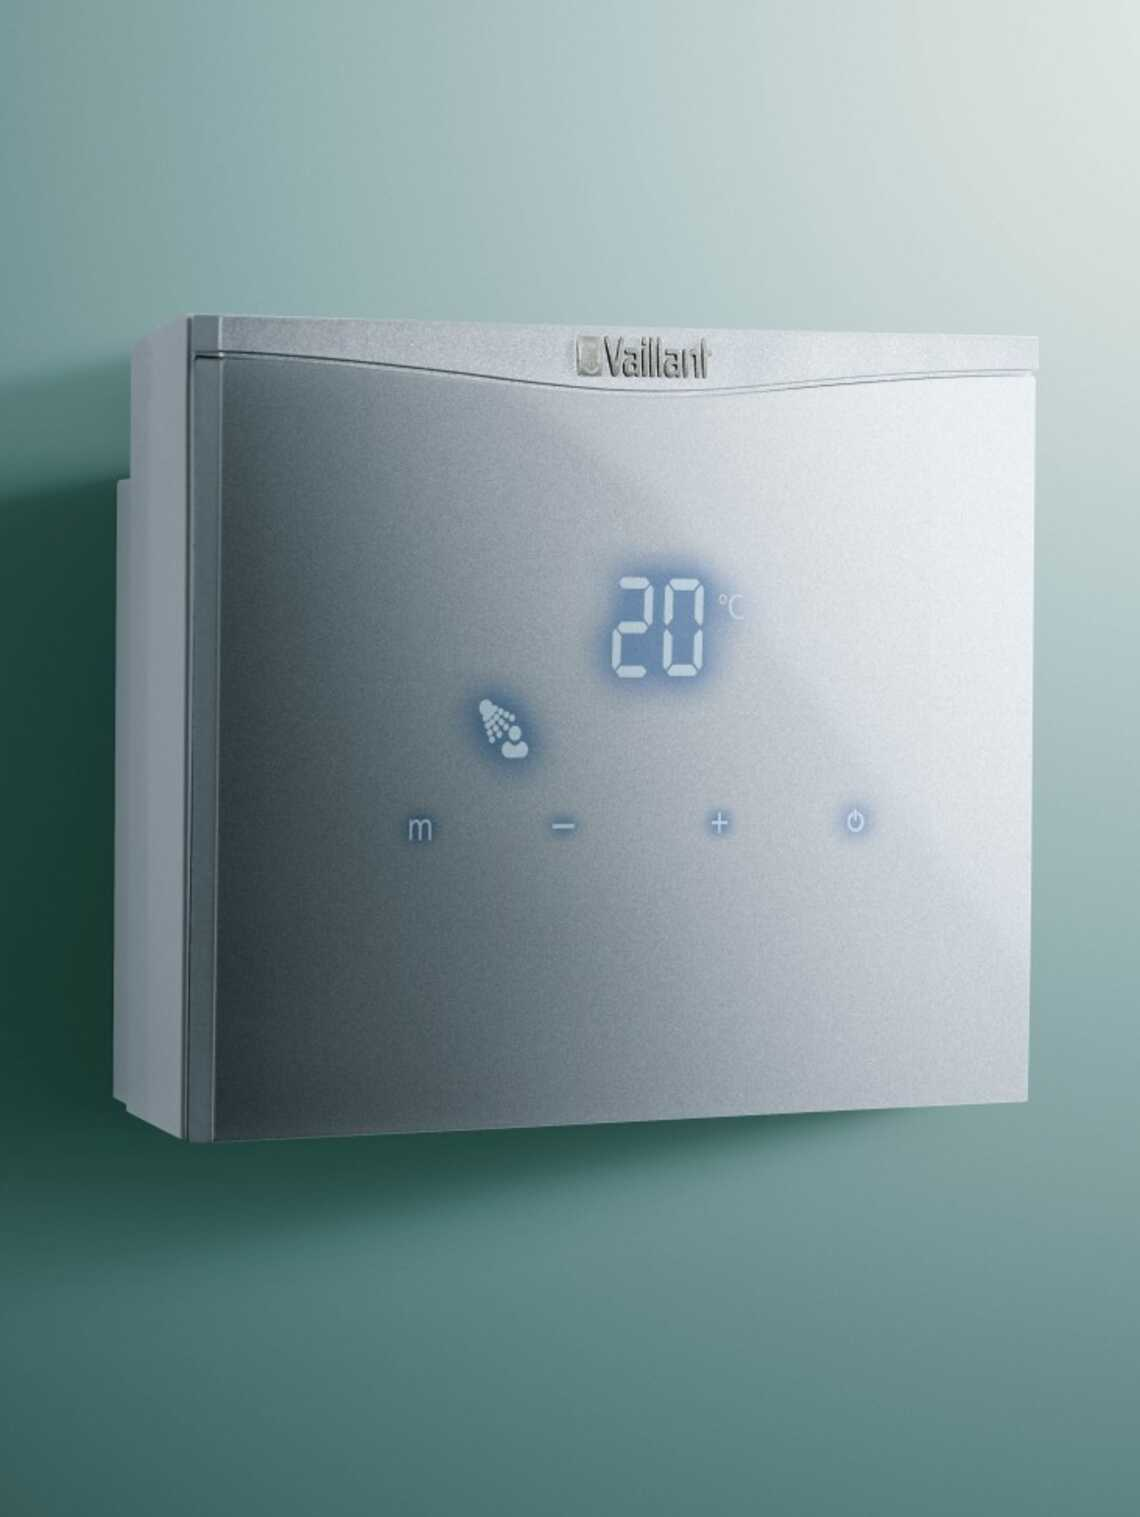 Scaldagno a gas da esterno outsidemag vaillant - Scaldabagno elettrico vaillant ...